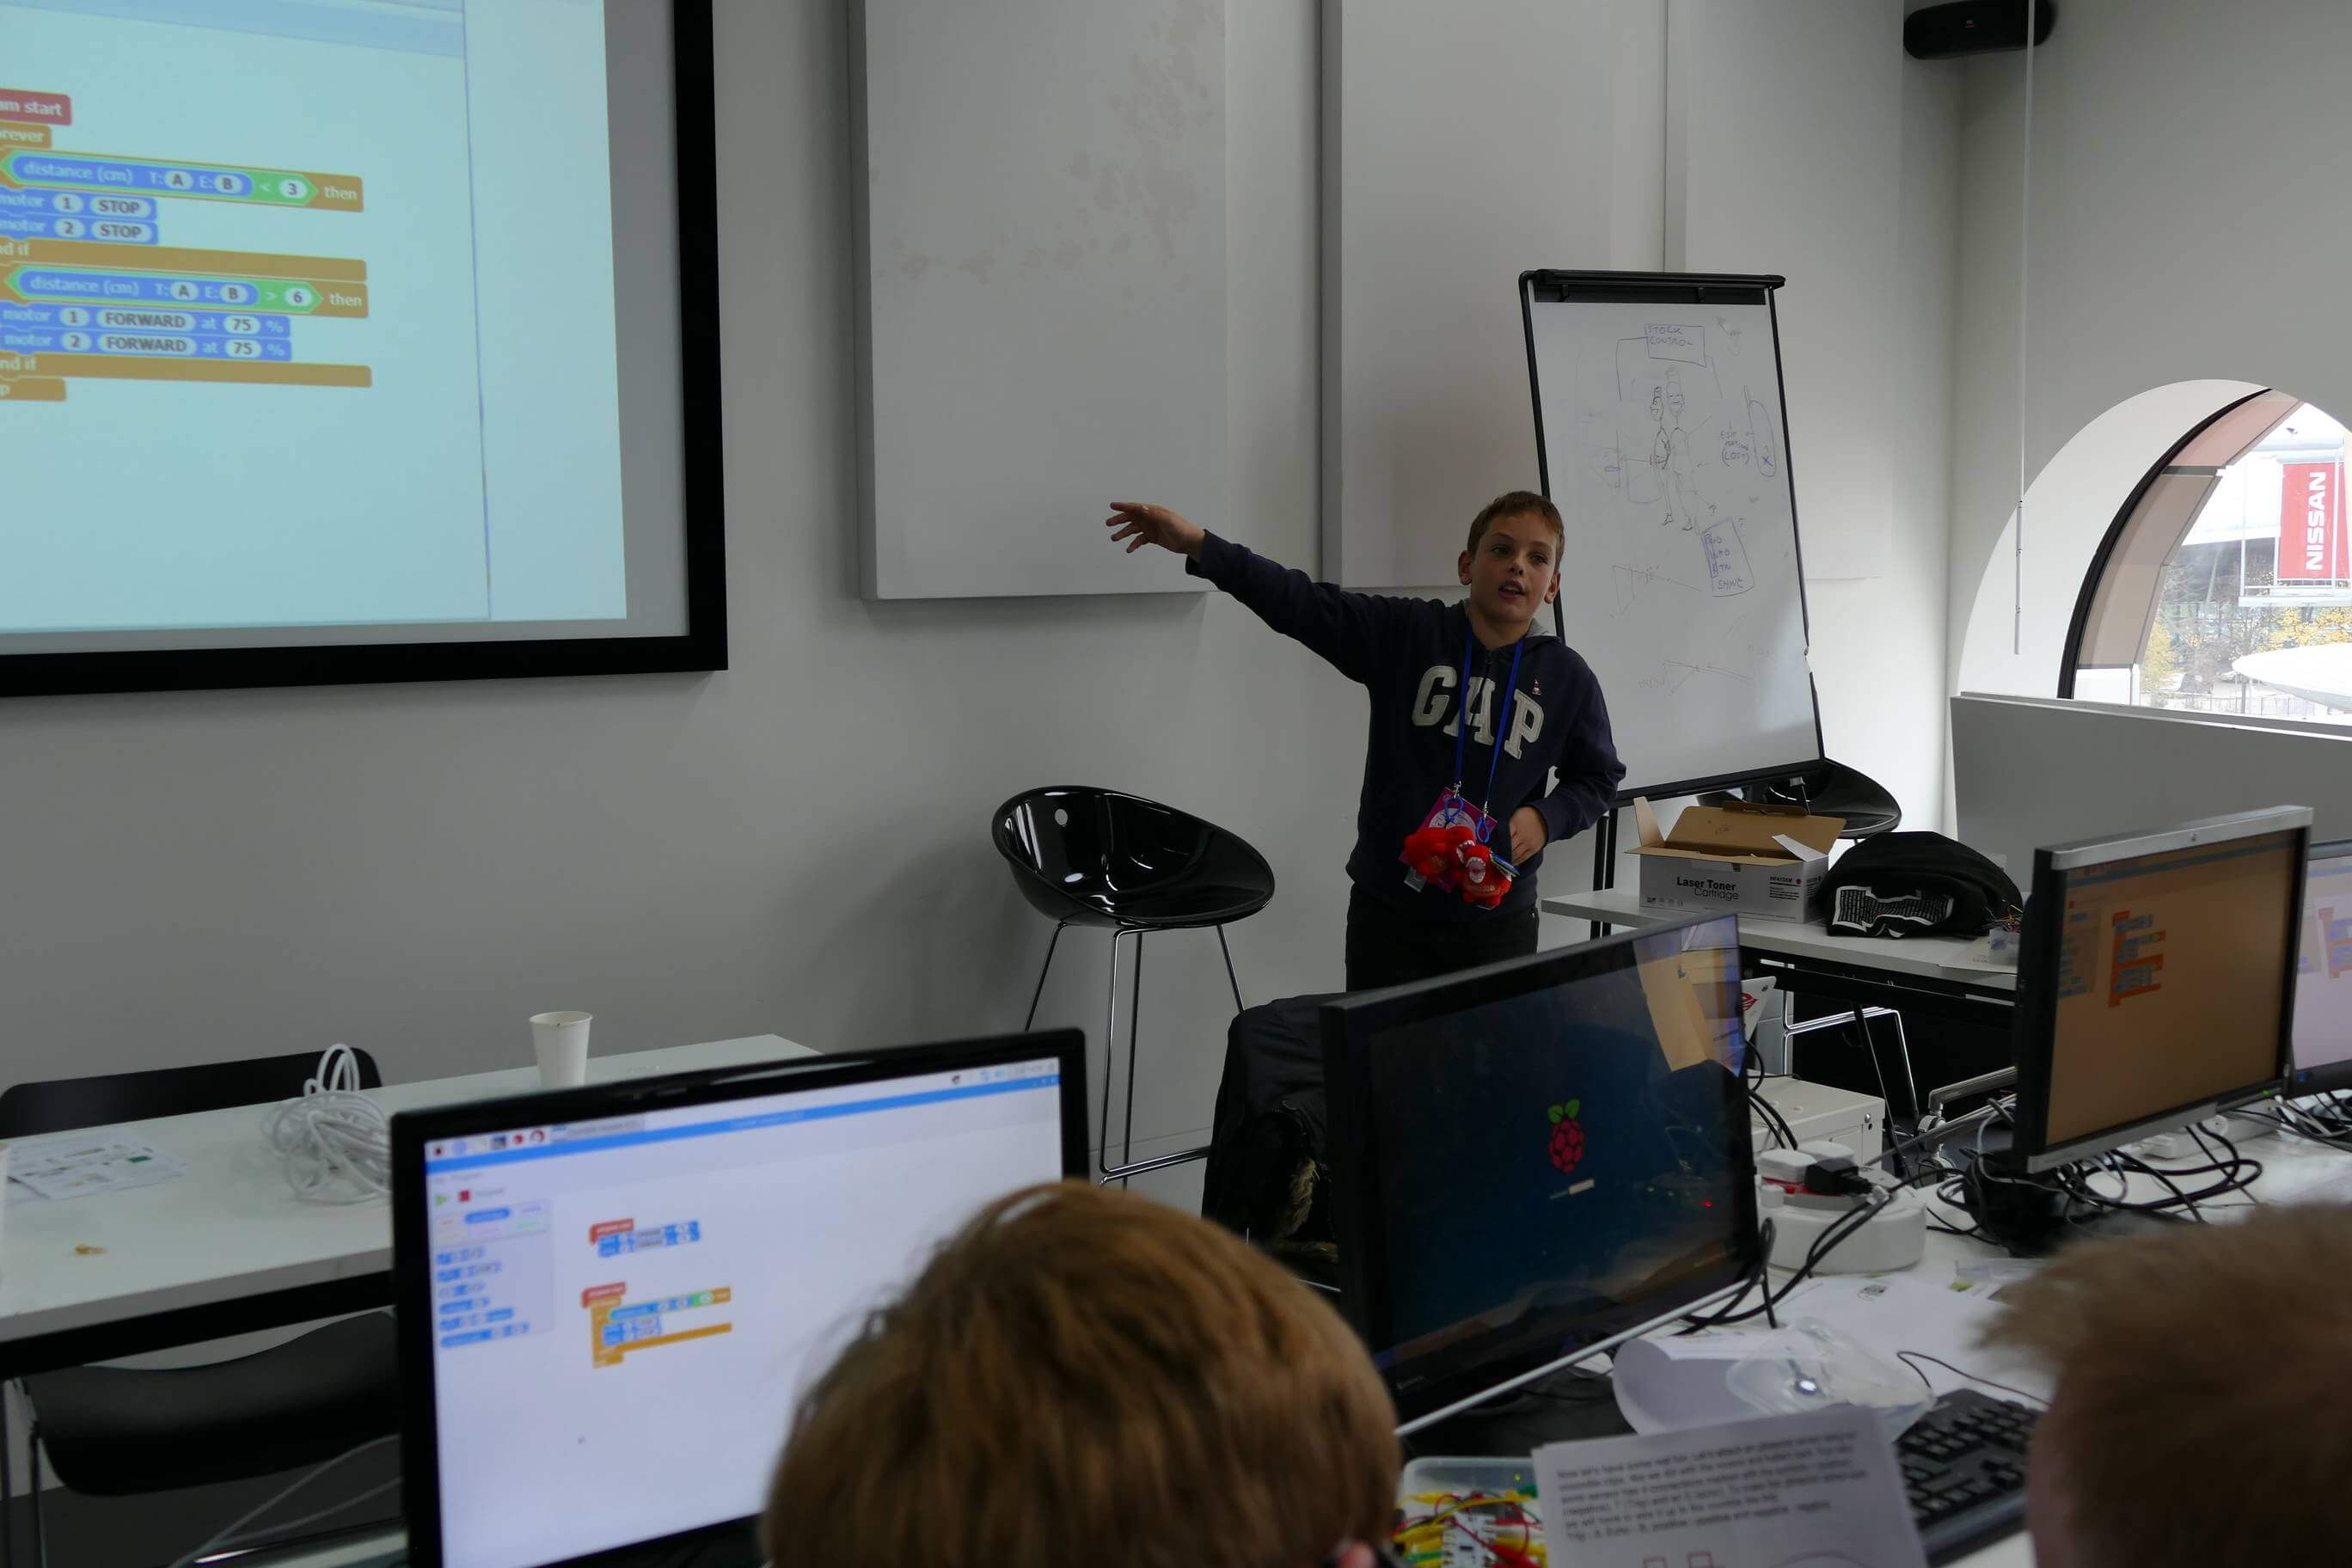 Femi MozFest Presenting